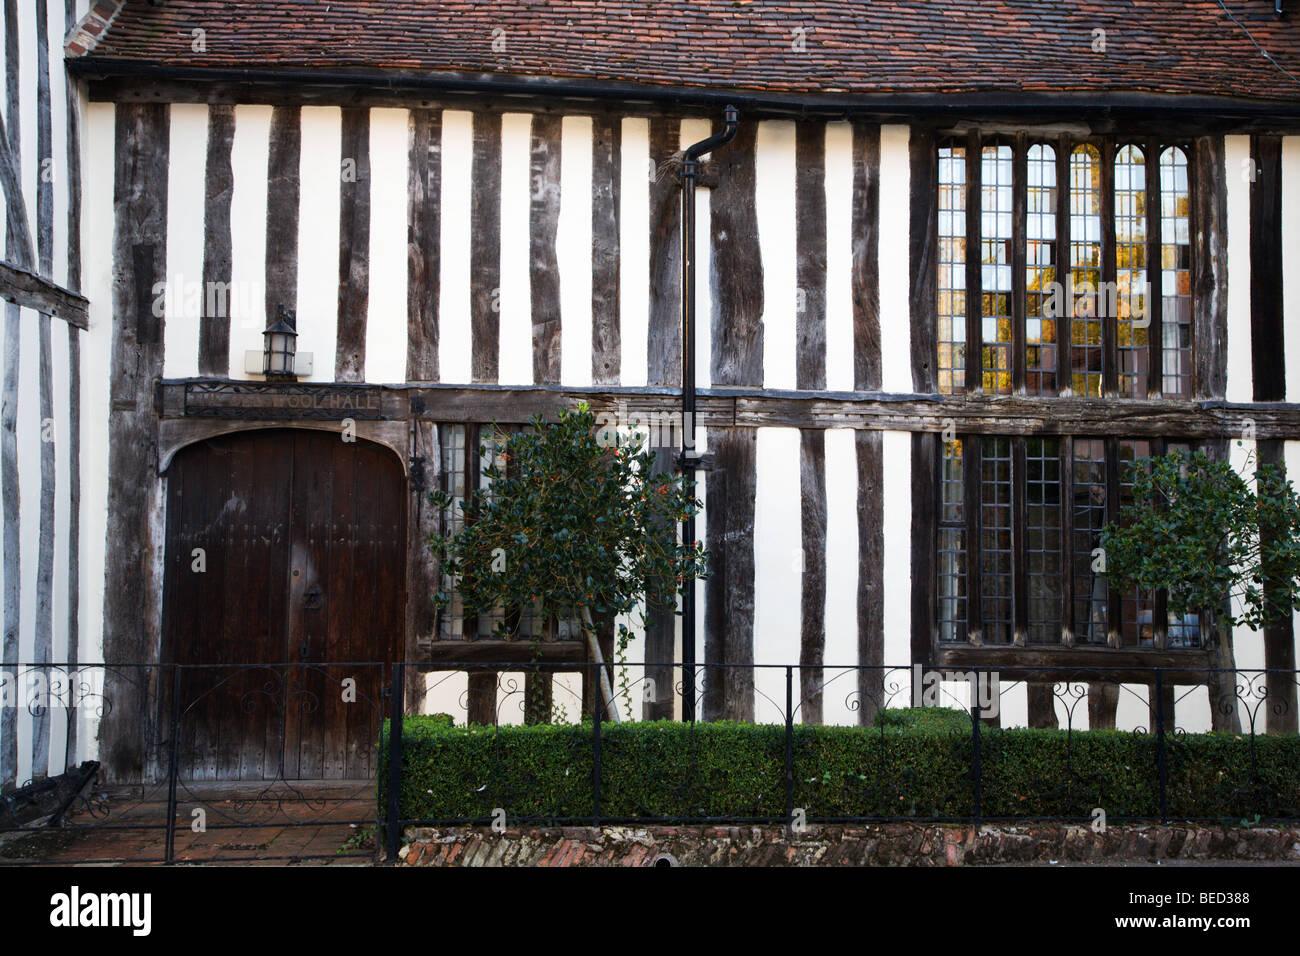 The Old Wool Hall Lavenham Suffolk England - Stock Image